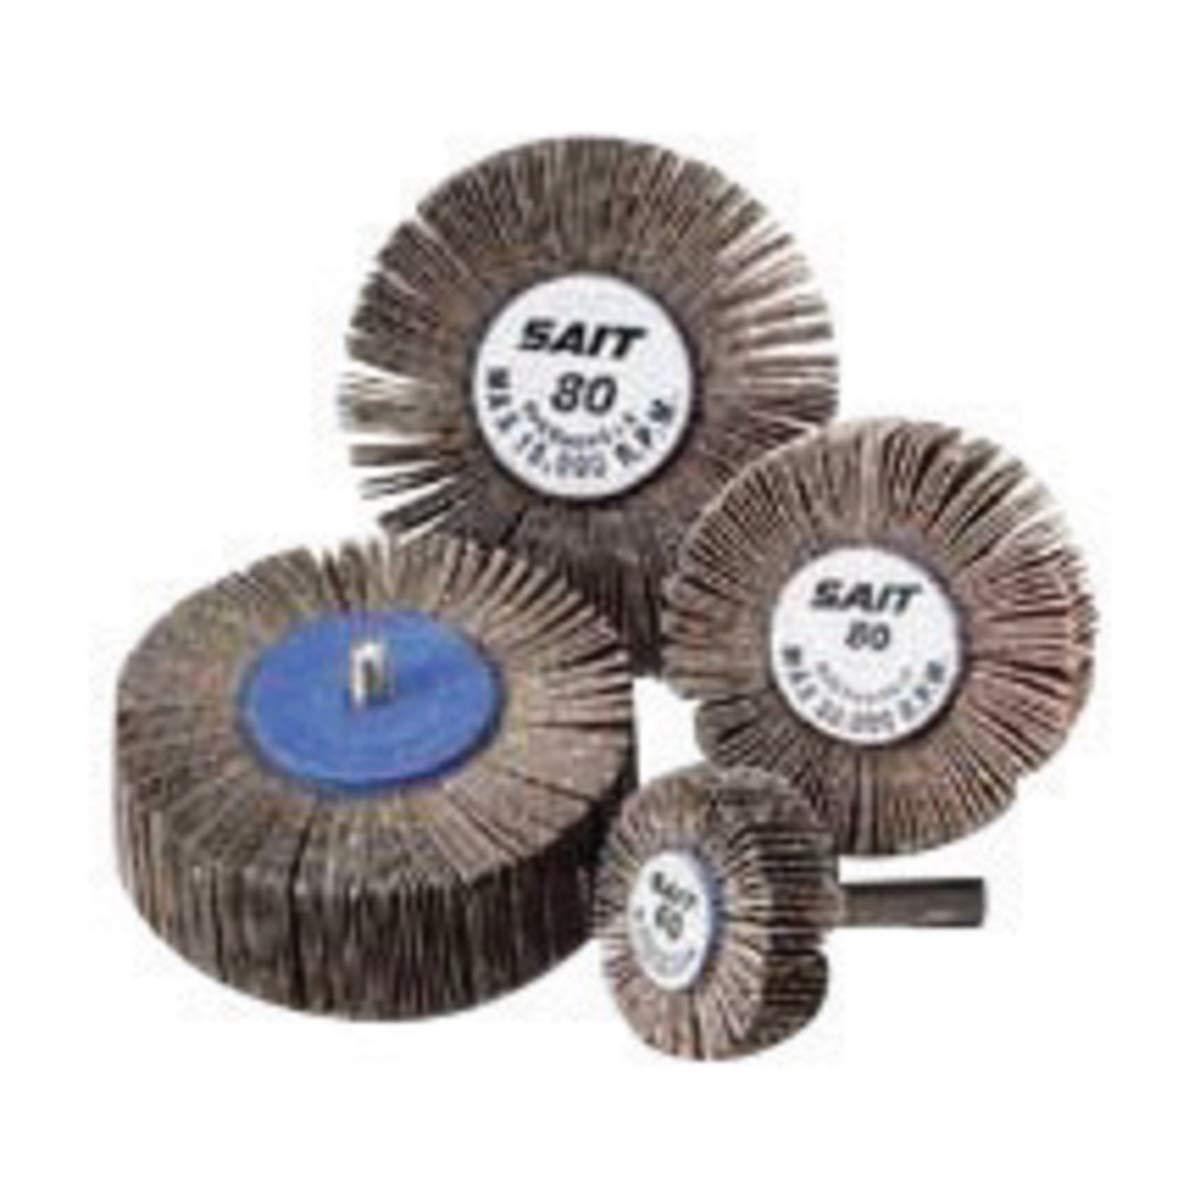 United Abrasives 3'' X 1'' X 1/4'' - 20 60 Grit 2A Aluminum Oxide Coated Flap Wheel - 120 Each/Case